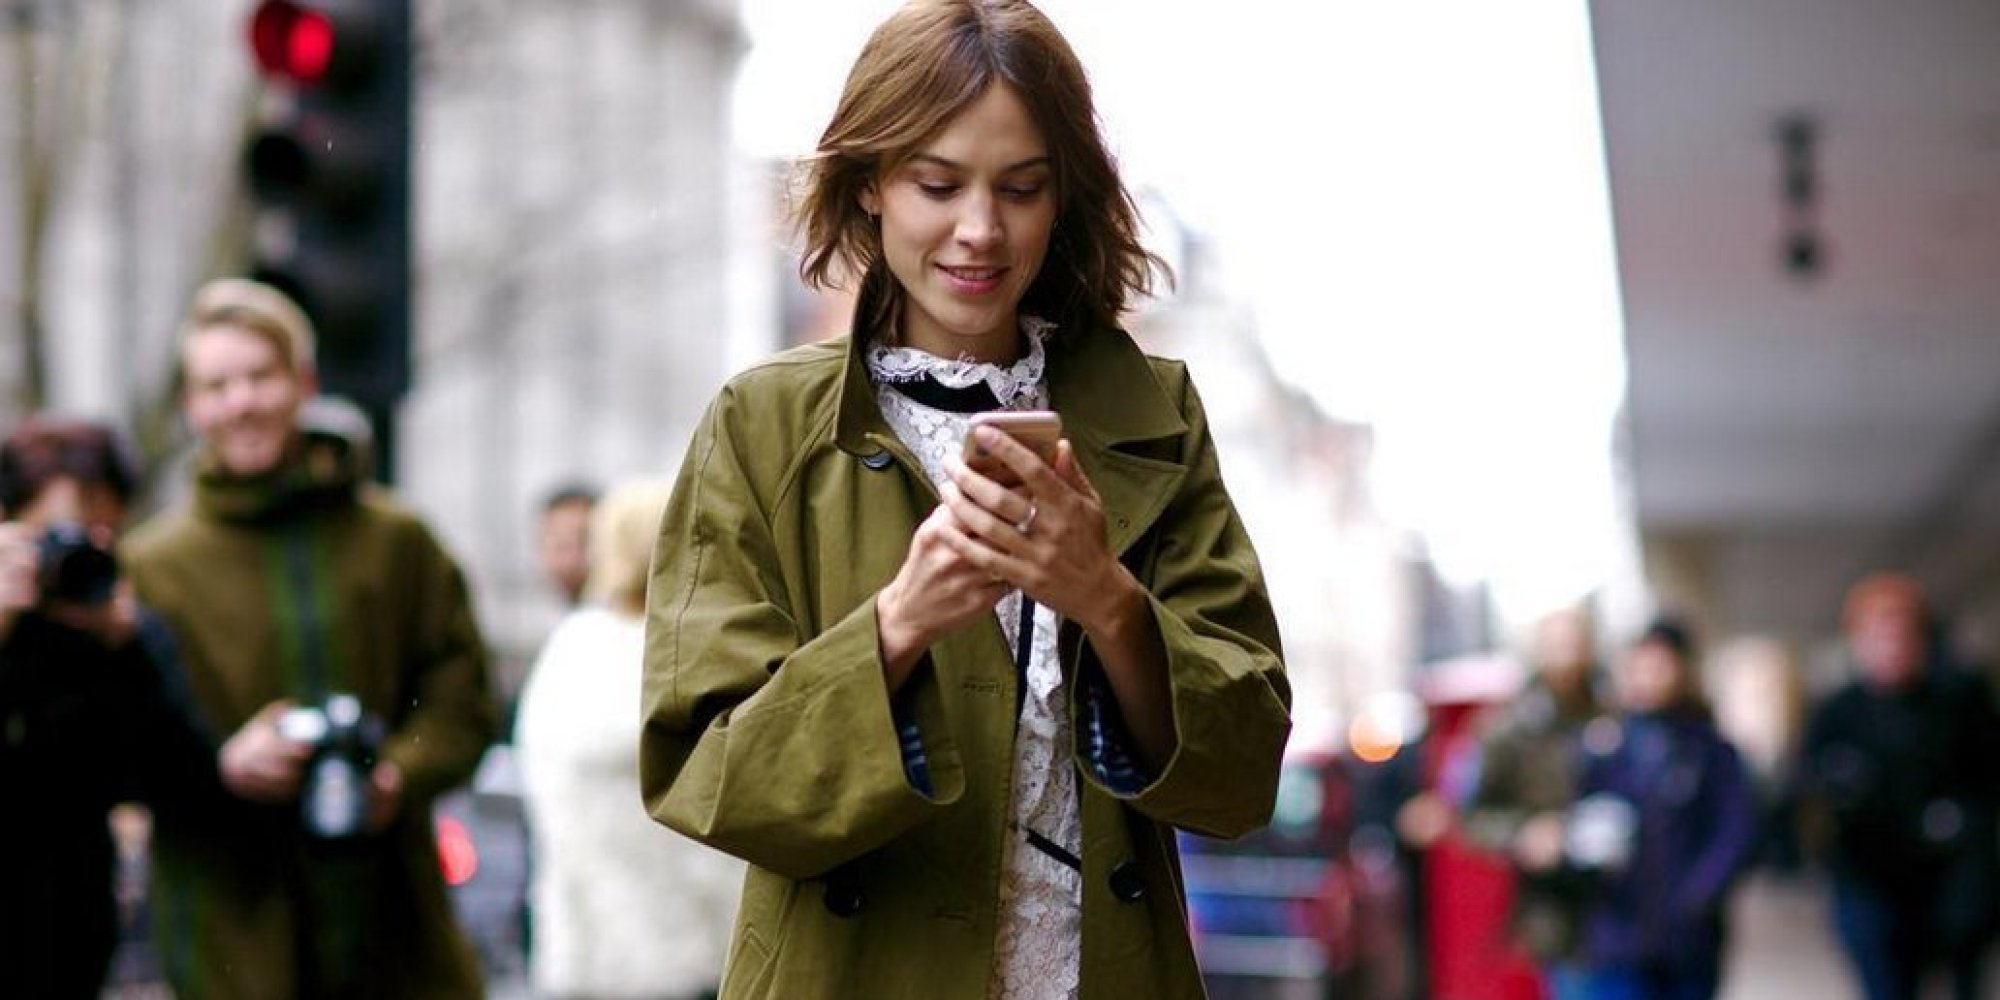 London Fashion Week 2016 Alexa Chung 39 S Outfits A